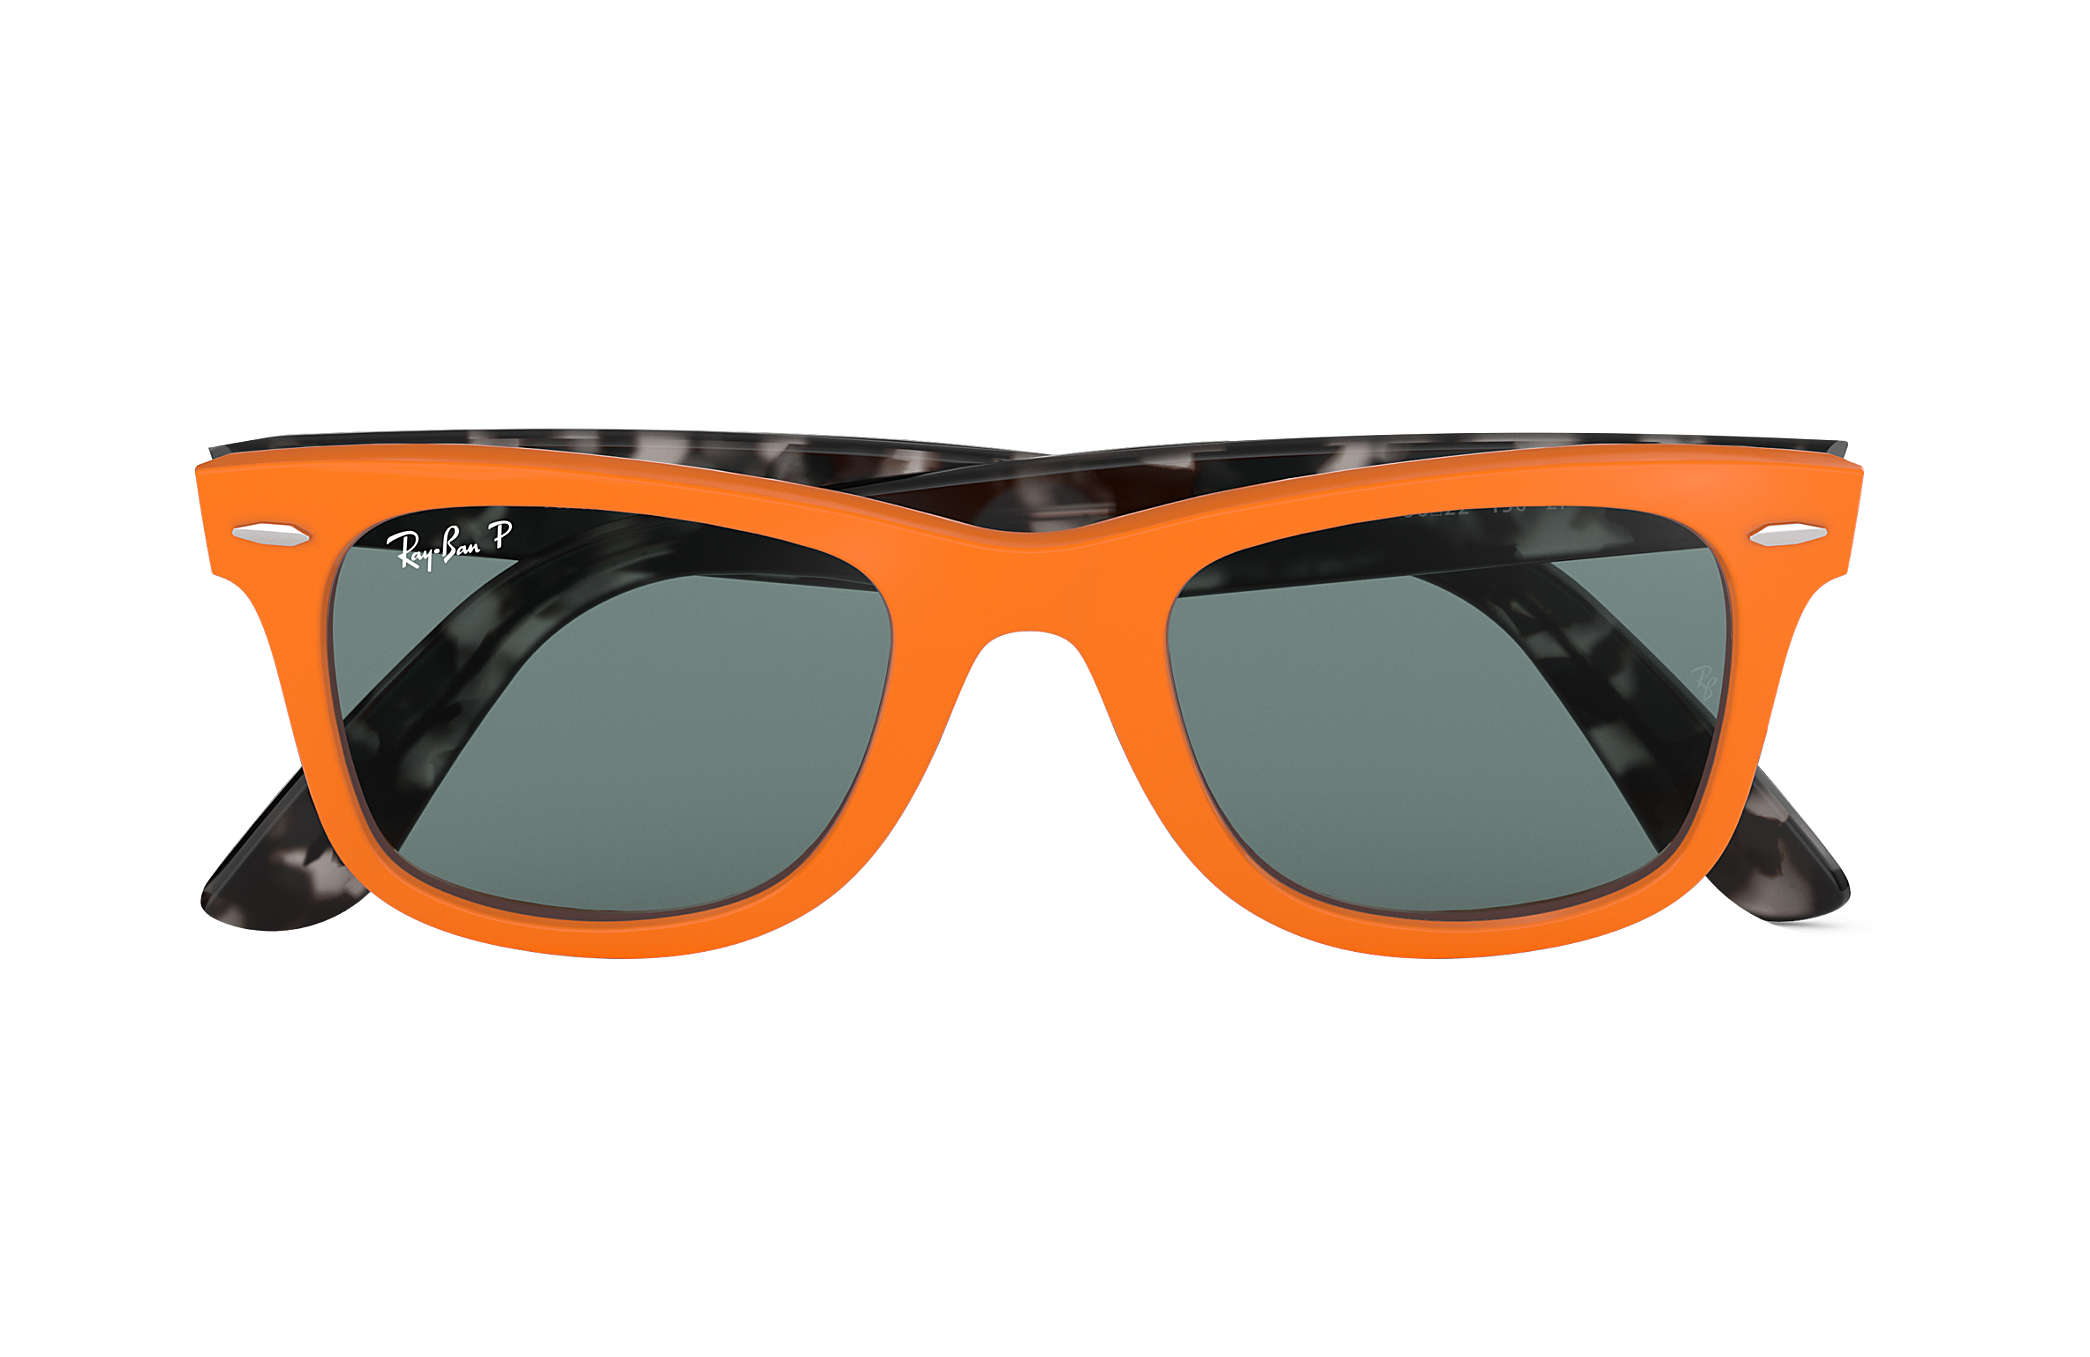 62771d5a59 Ray-Ban Wayfarer Pop RB2140 Orange - Acetate - Grey Polarized Lenses ...